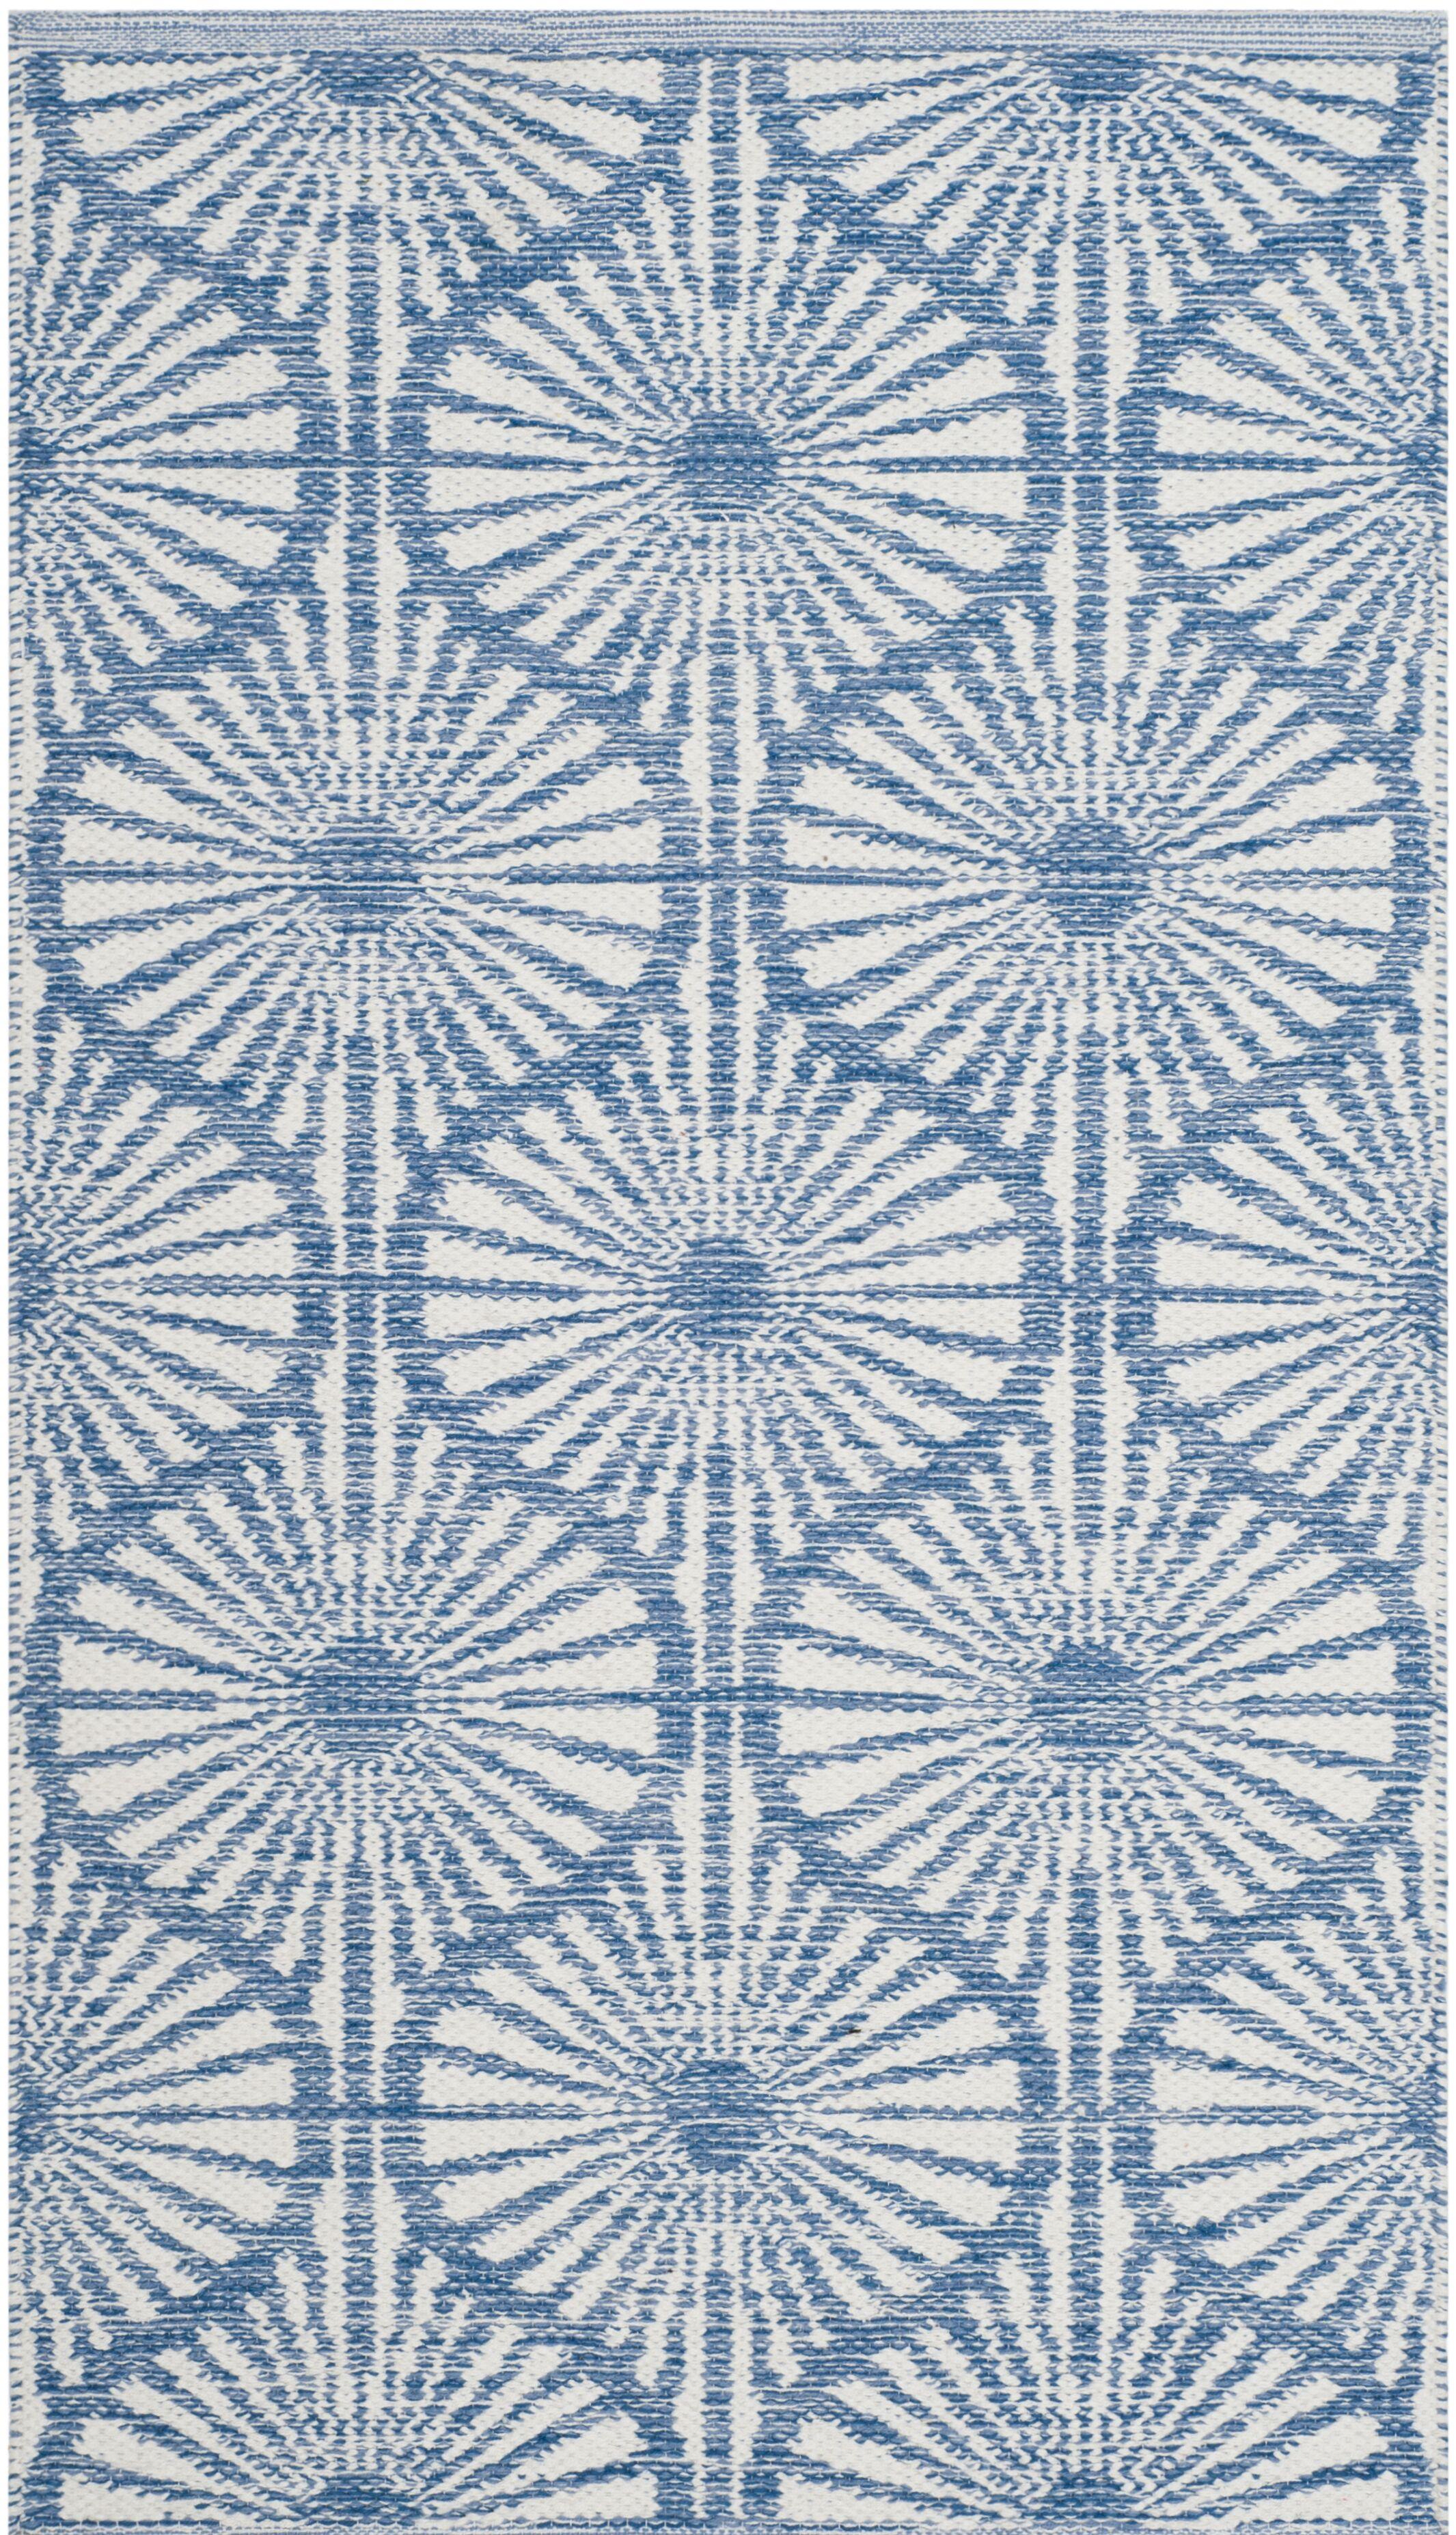 Oak Hill Hand-Woven Blue/Ivory Area Rug Rug Size: Rectangle 8' x 10'